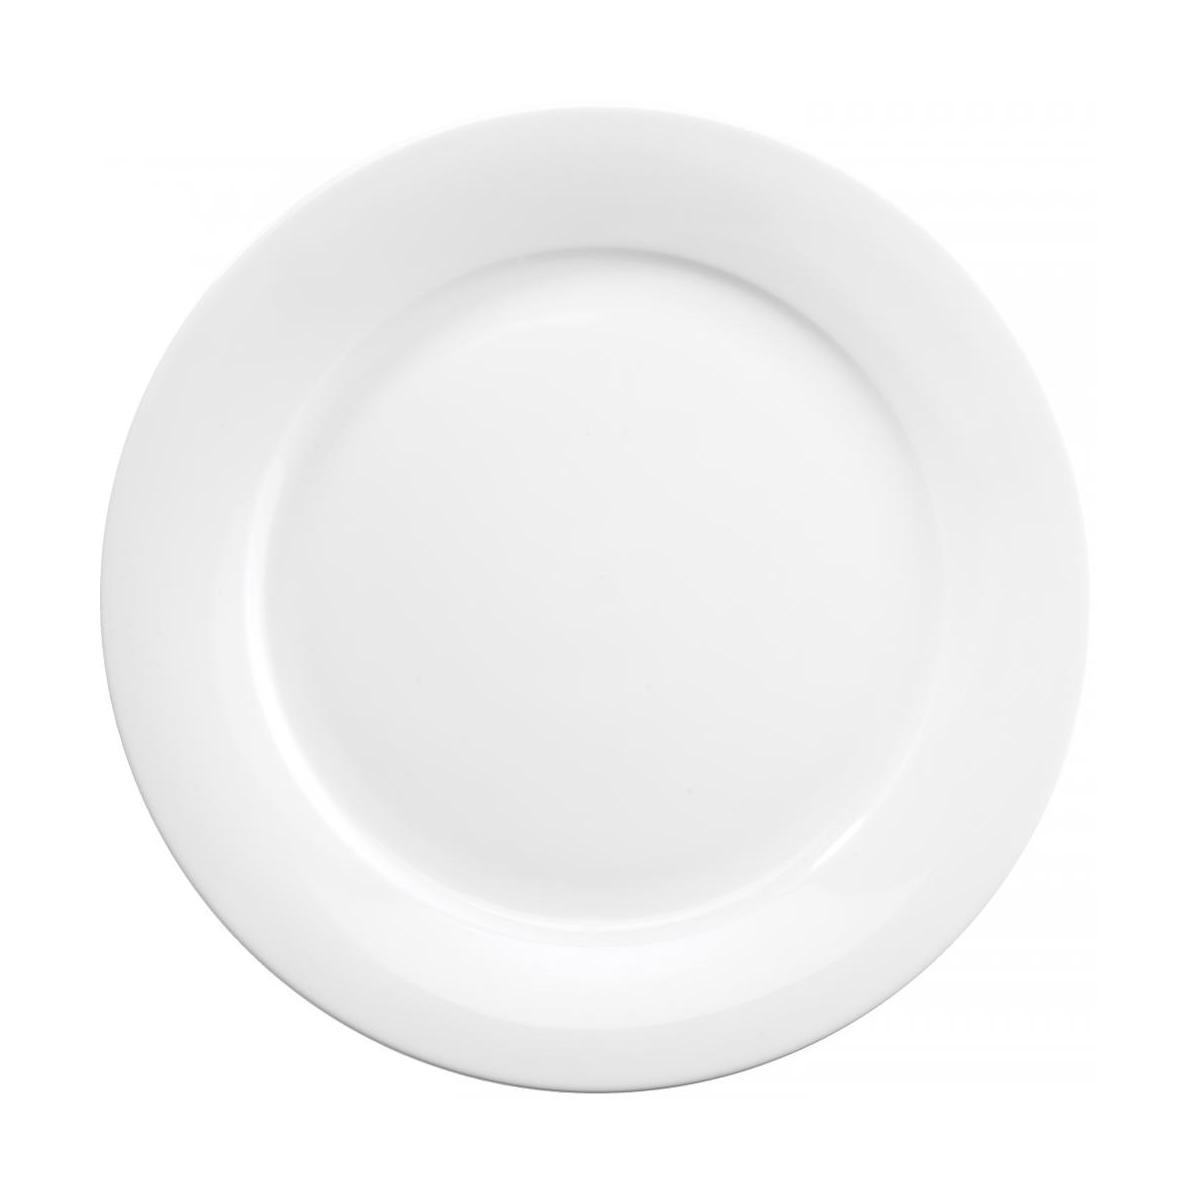 Churchill 39 s 39 art de cuisine menu 39 mid rimmed plate 17 for Art de cuisine churchill